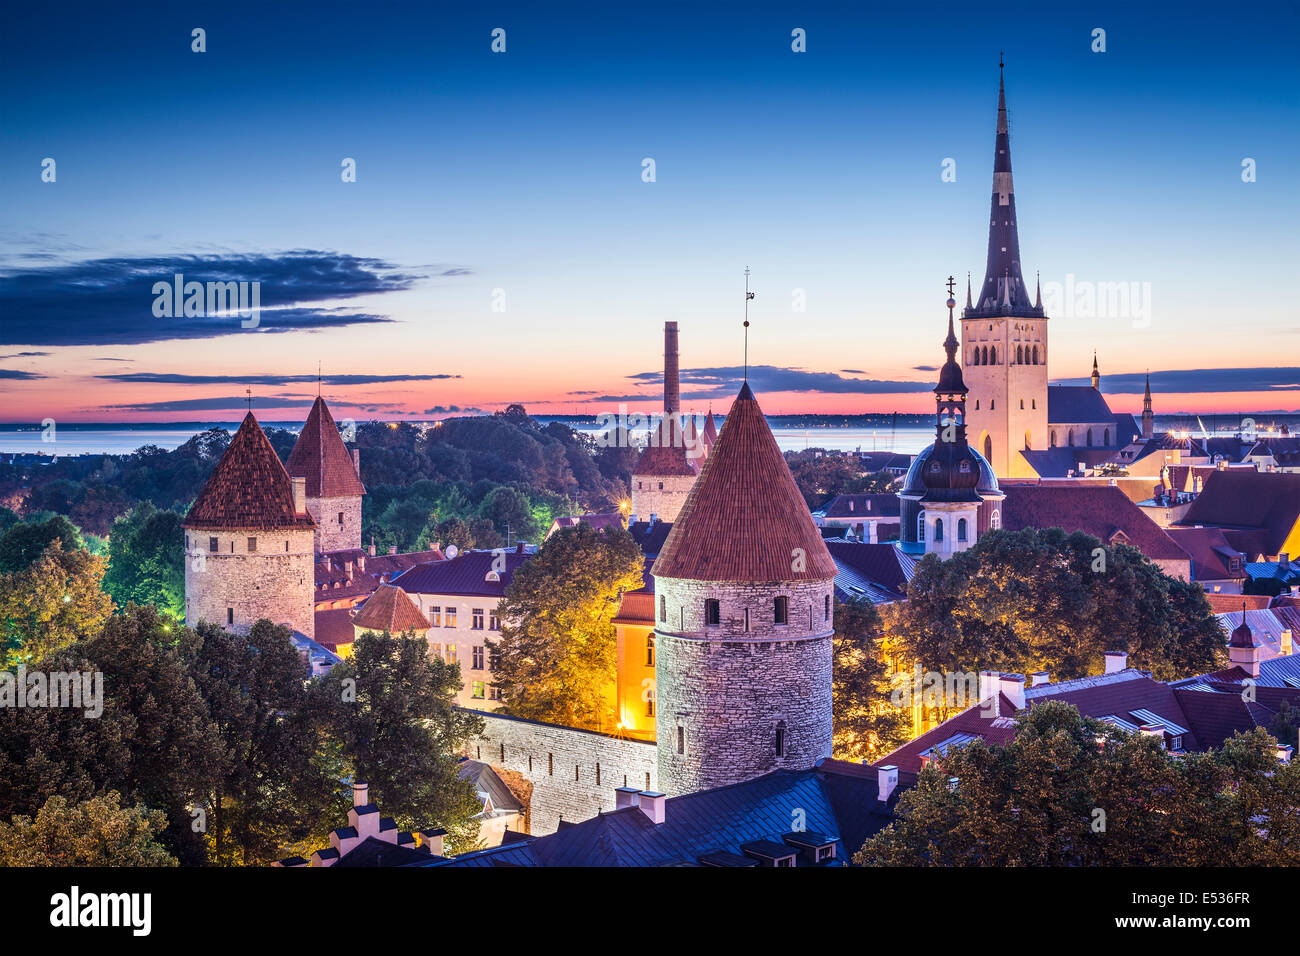 Tallinn, Estonia at dawn. Stock Photo